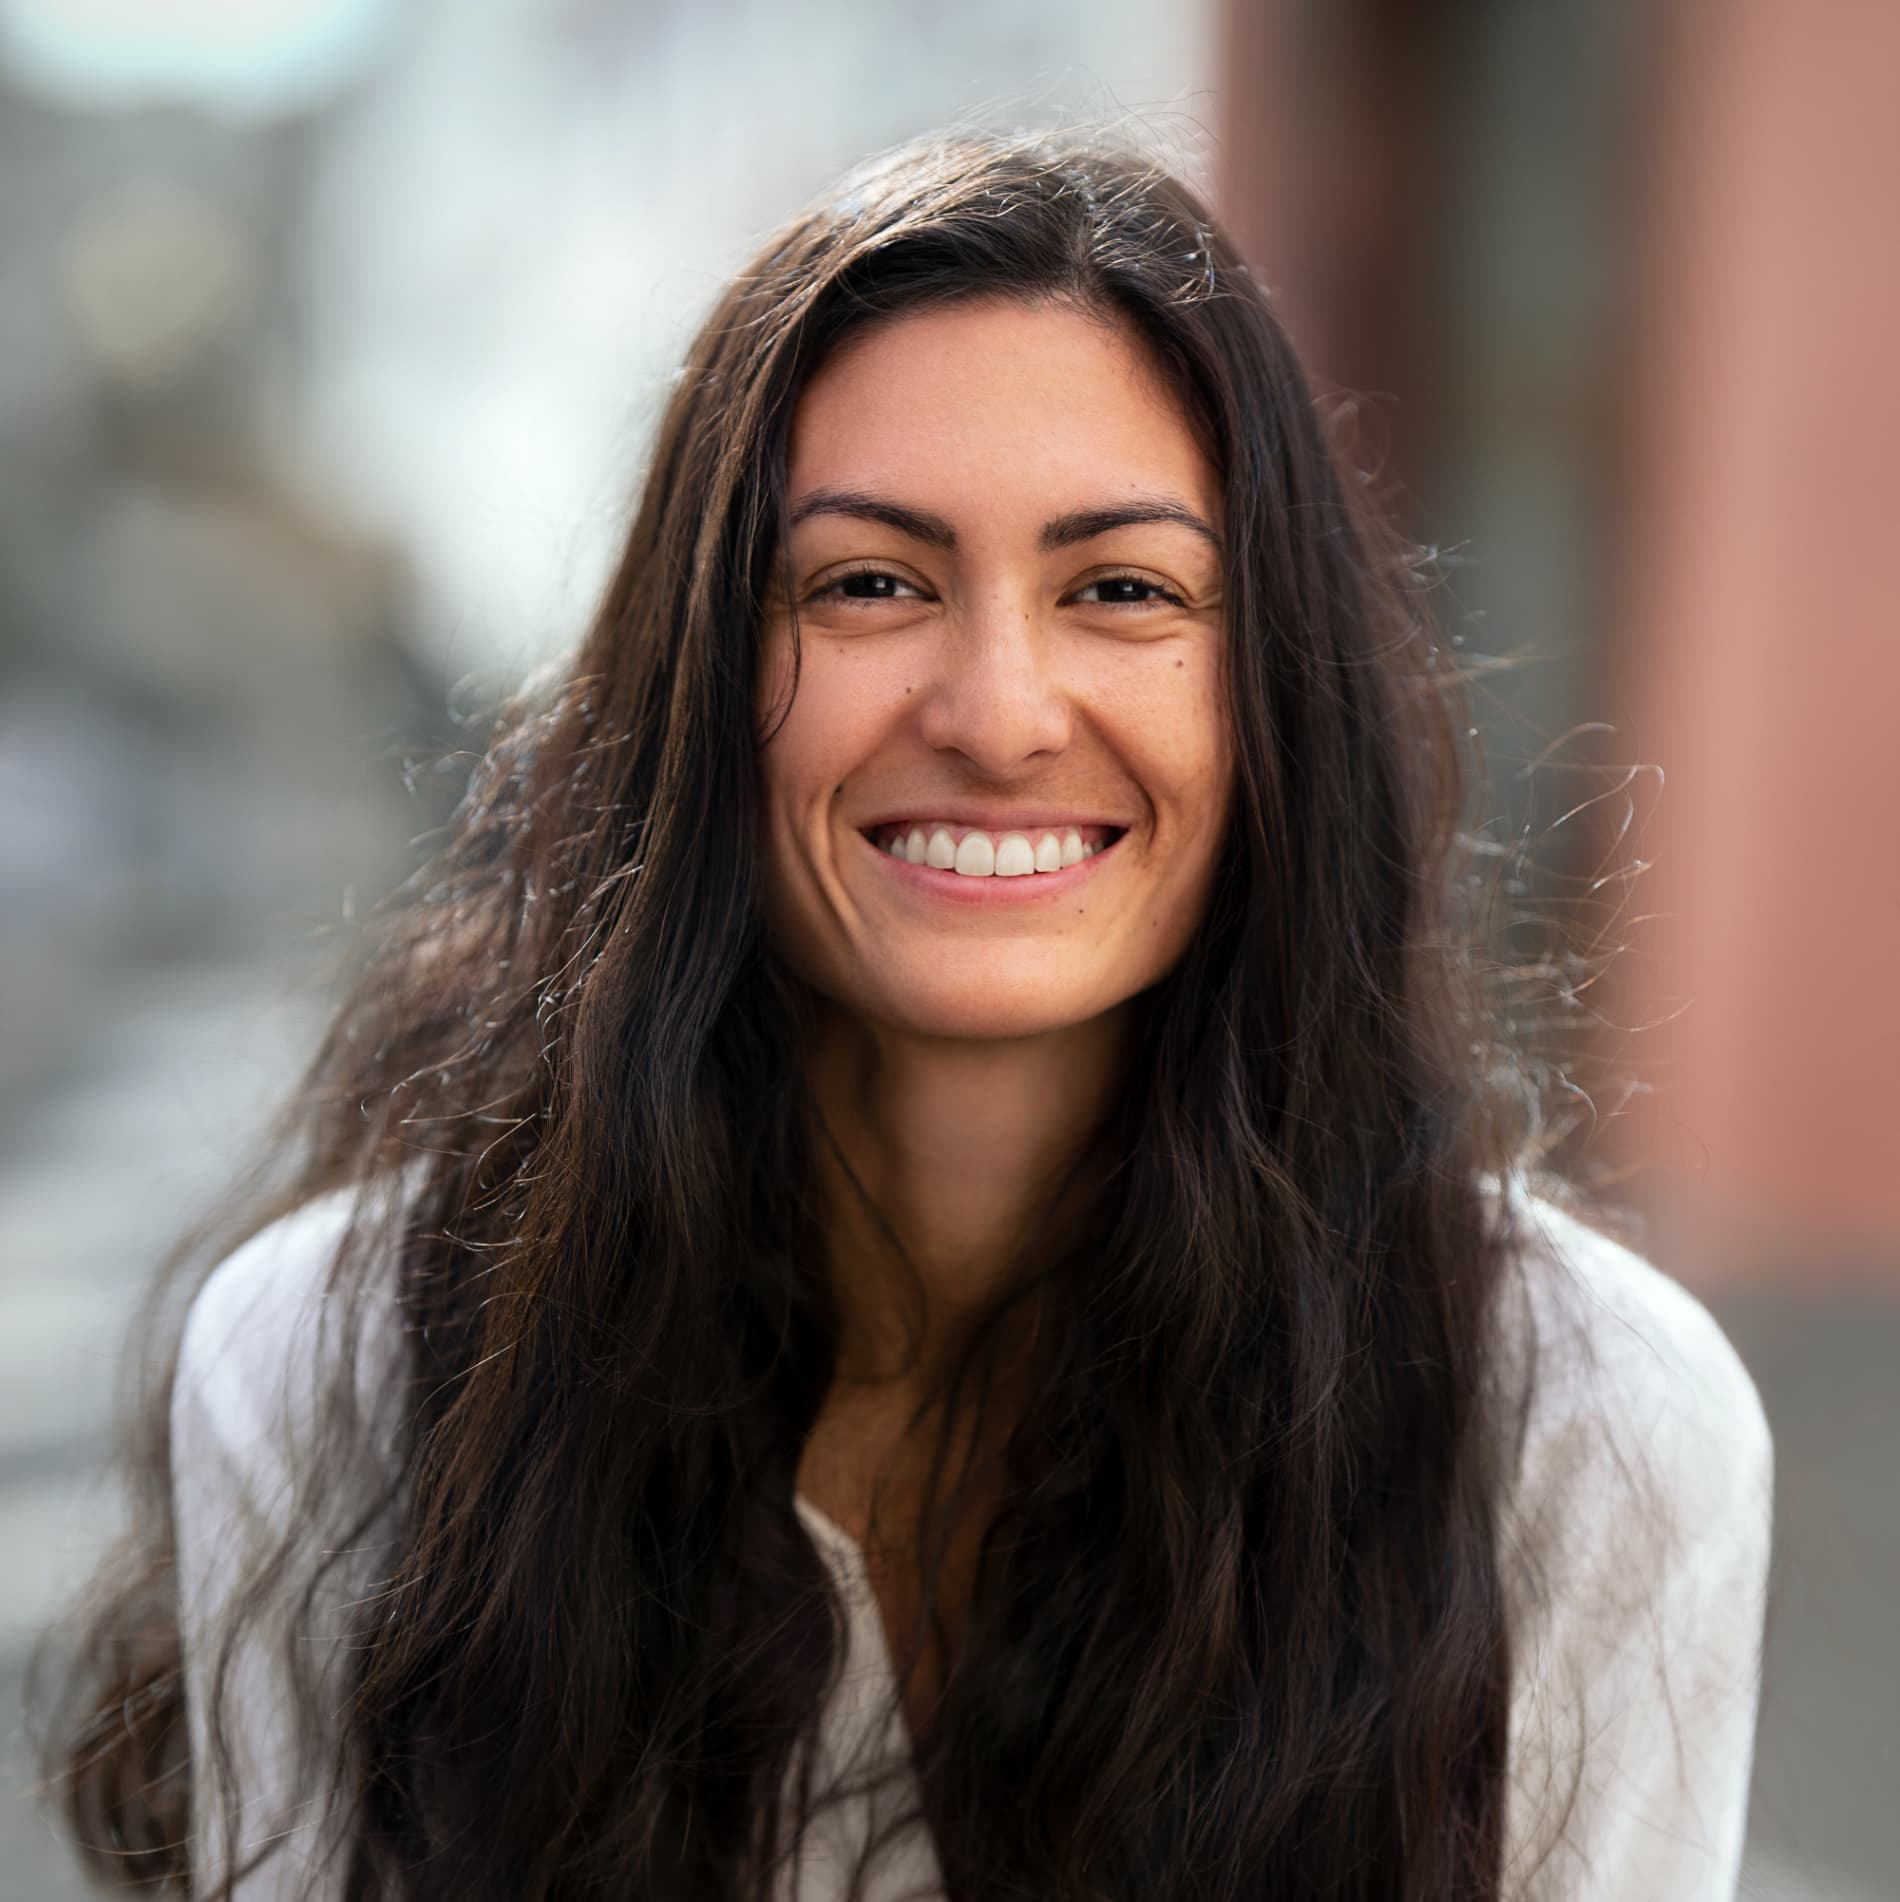 Catherine Schubiger Flores (Switzerland) Smiling